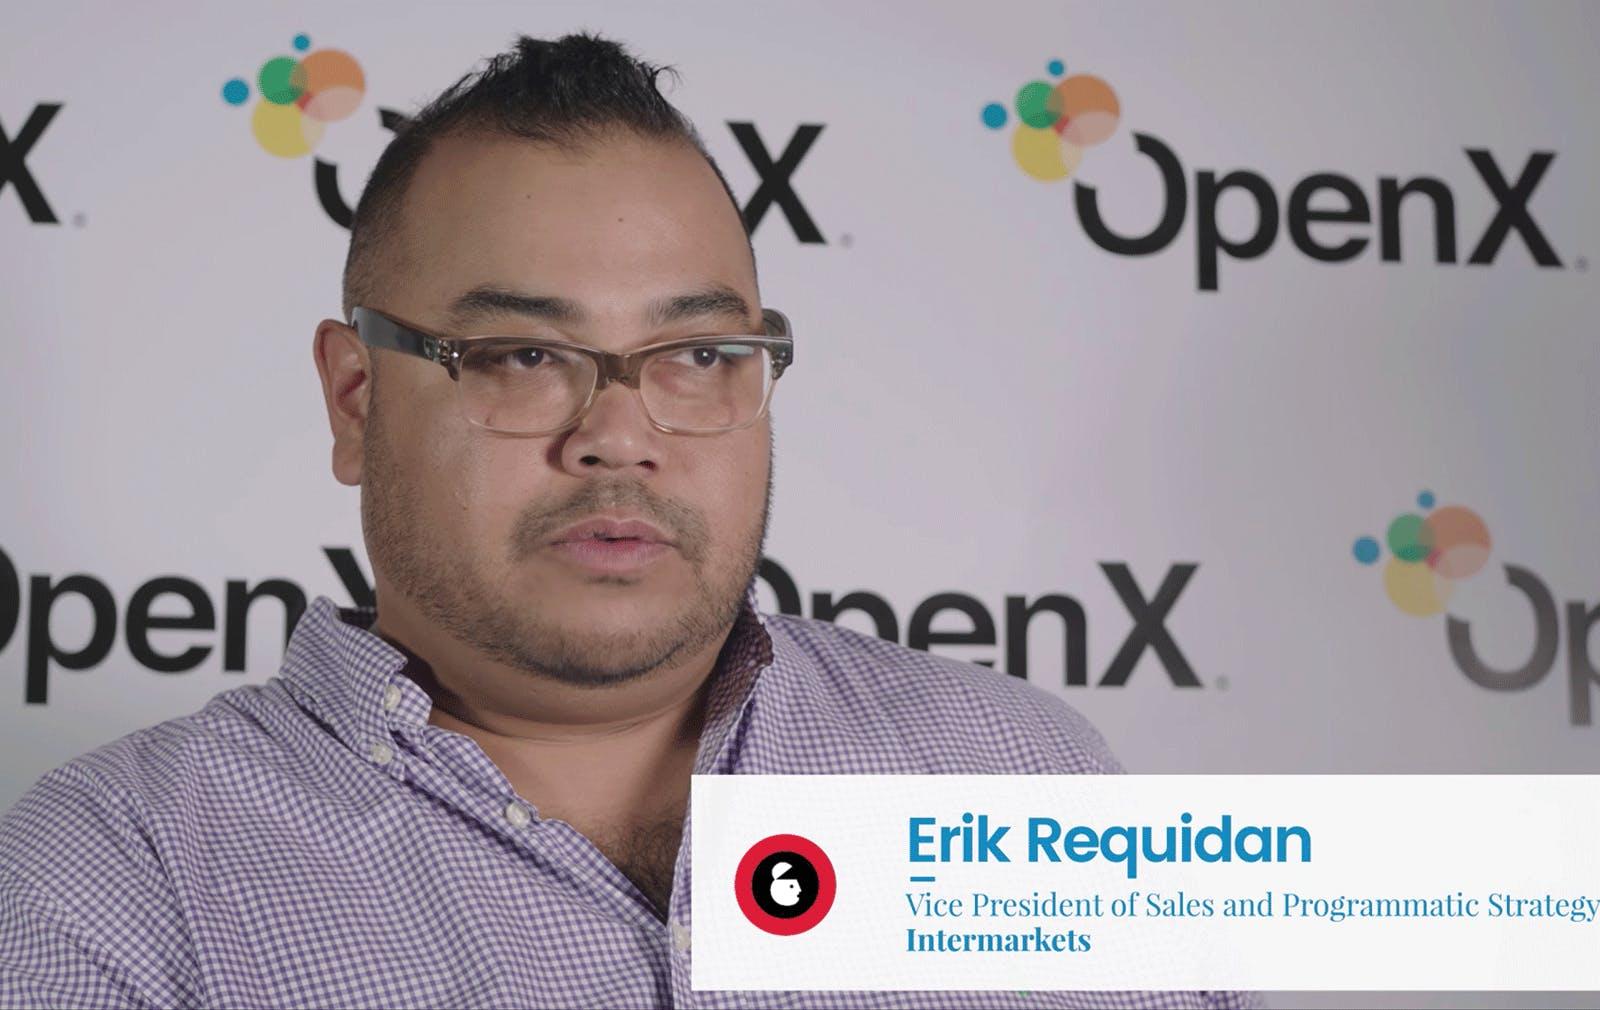 Intermarkets' Erik Requidan Backstage at Advertising Week NY 2017